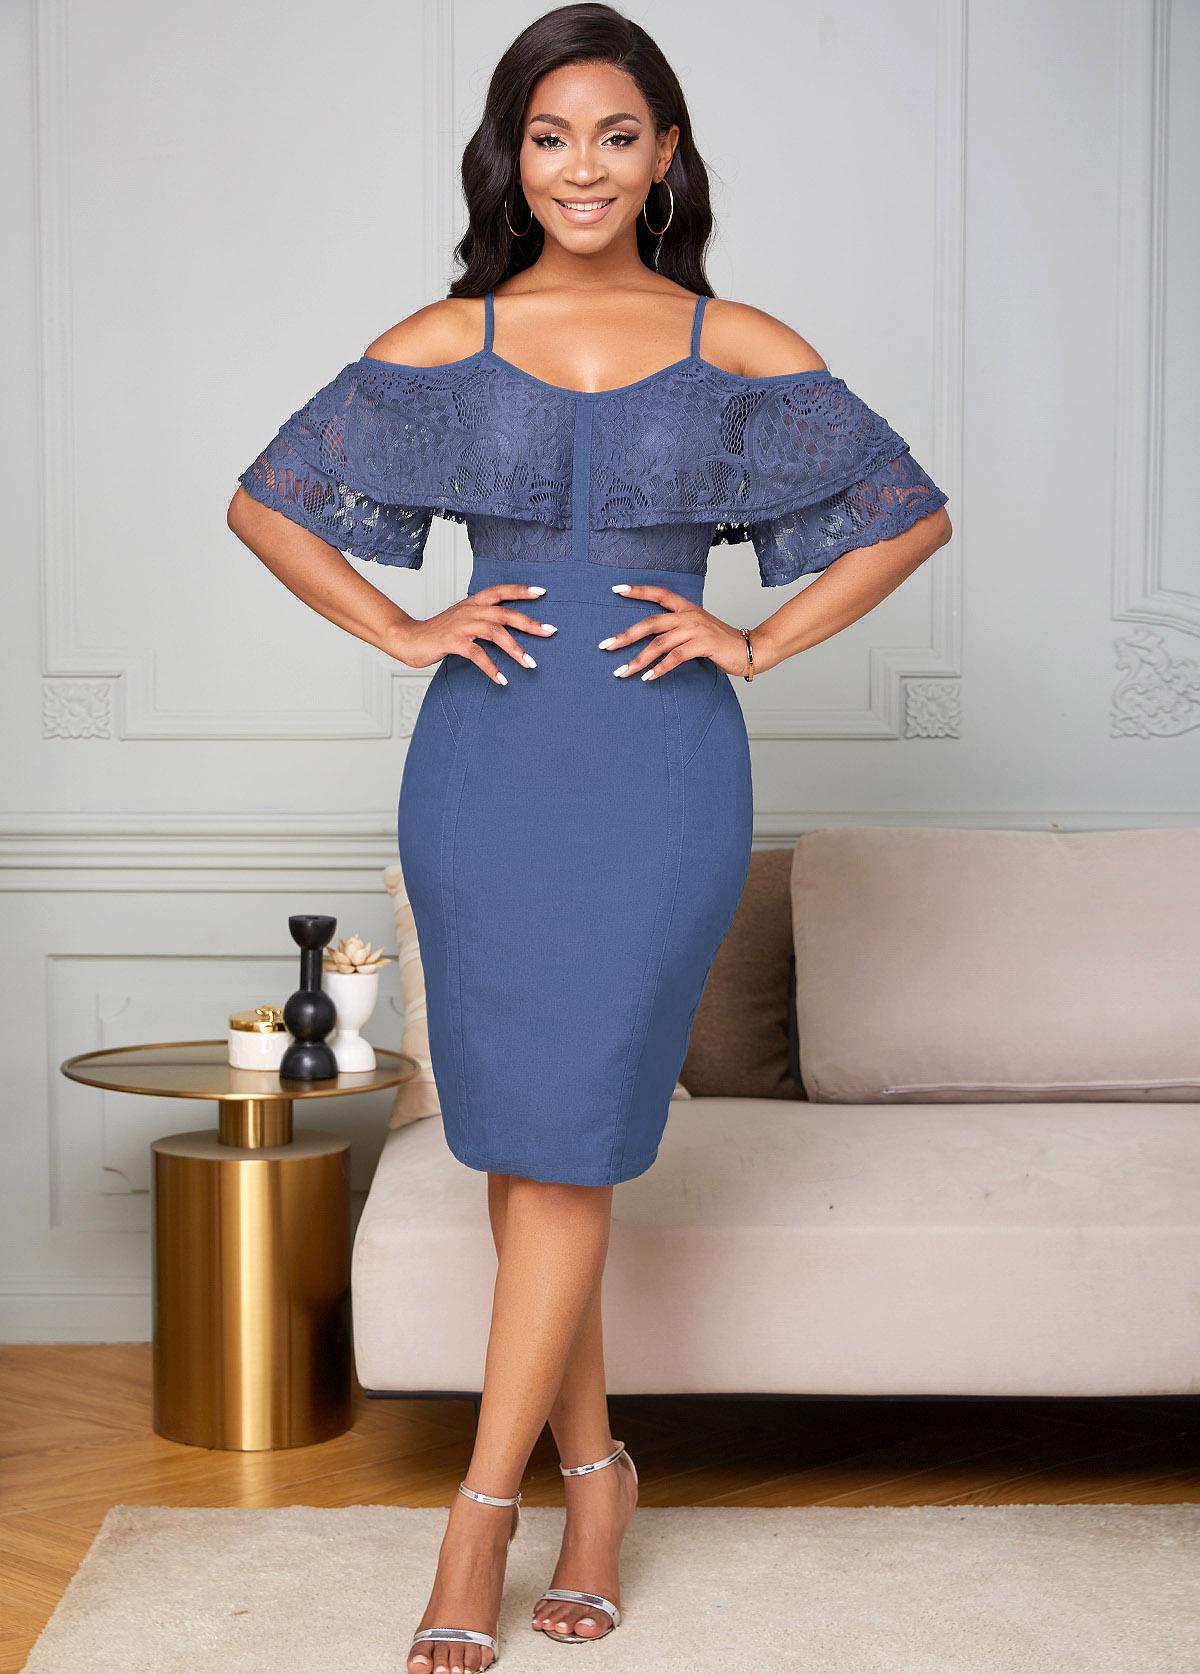 ROTITA Lace Panel Strappy Cold Shoulder Bodycon Dress